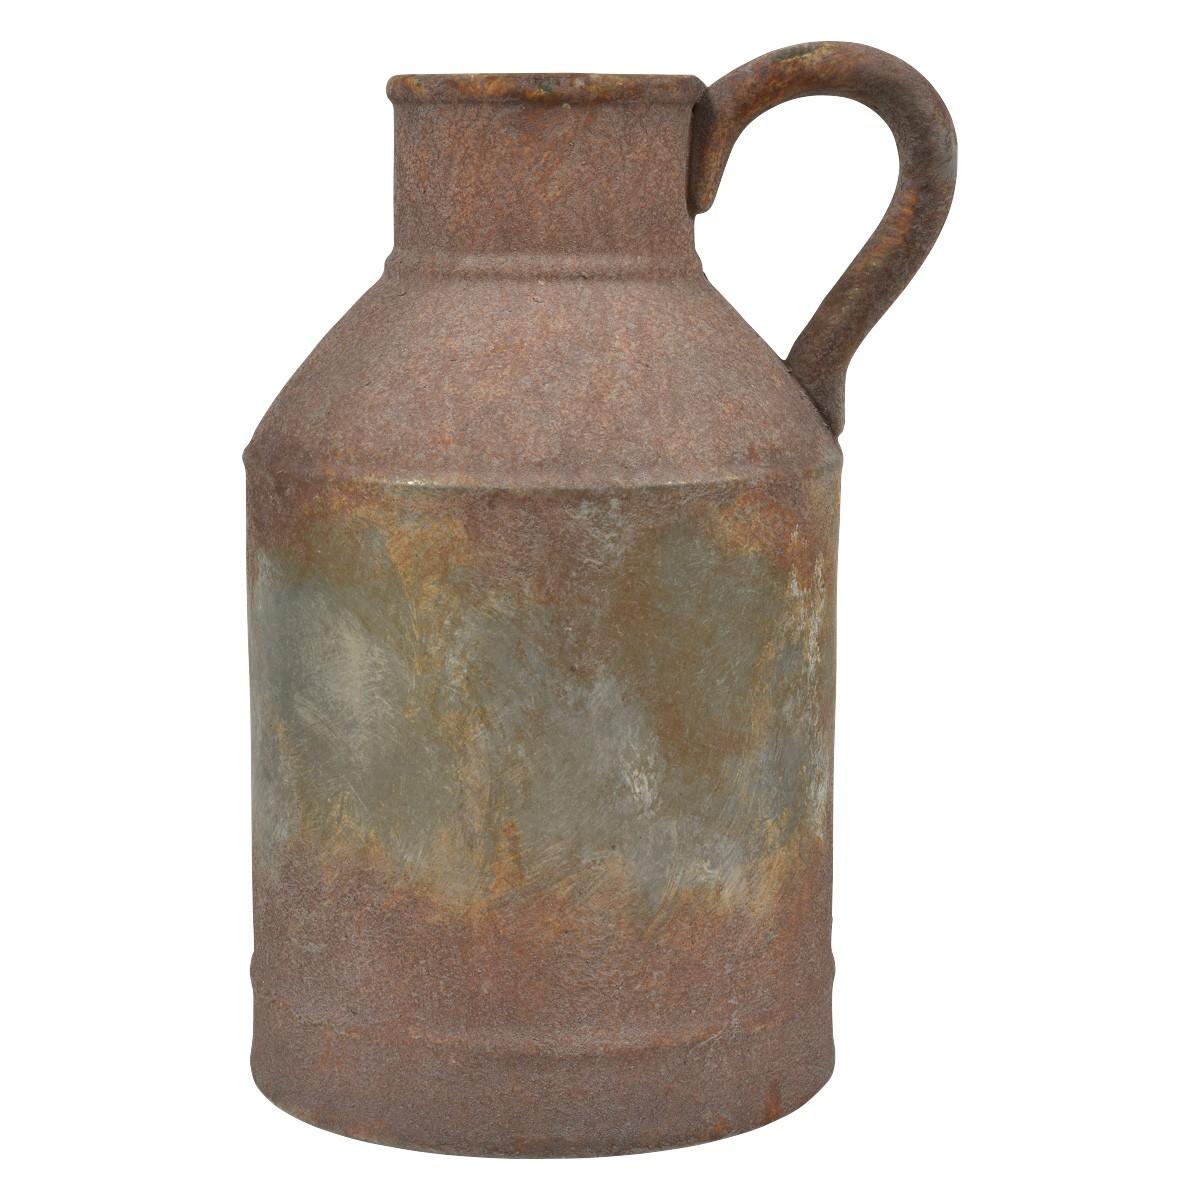 Provence Rustic Ceramic Jug, Large